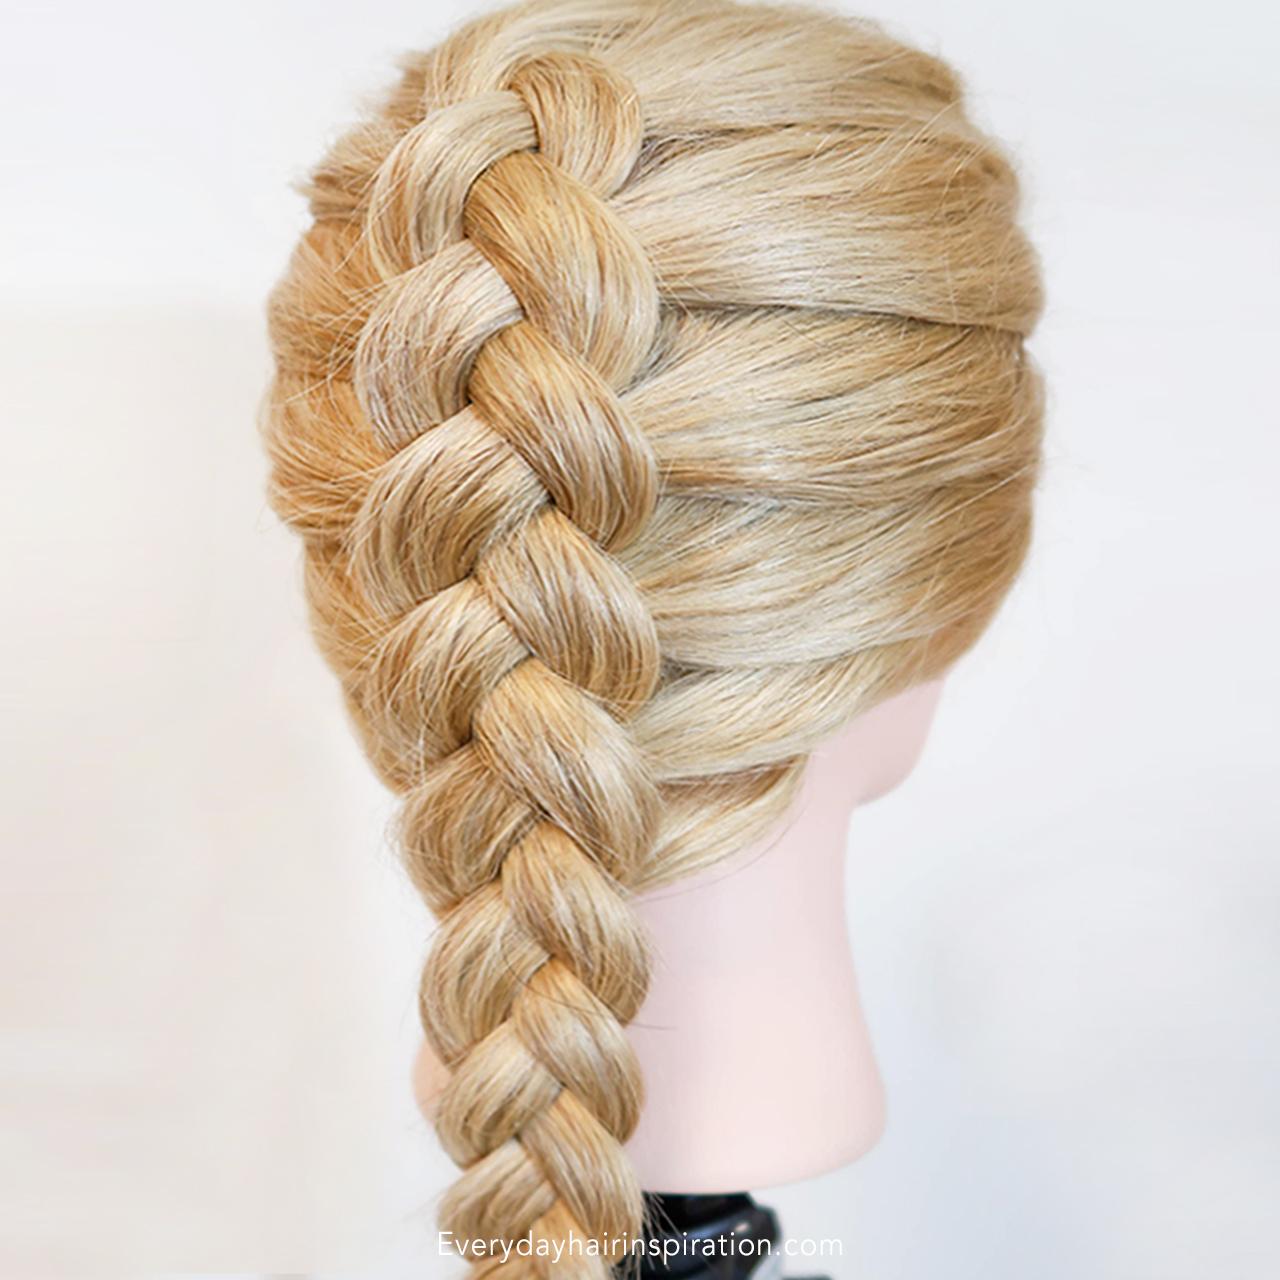 Everyday Hair Inspiration